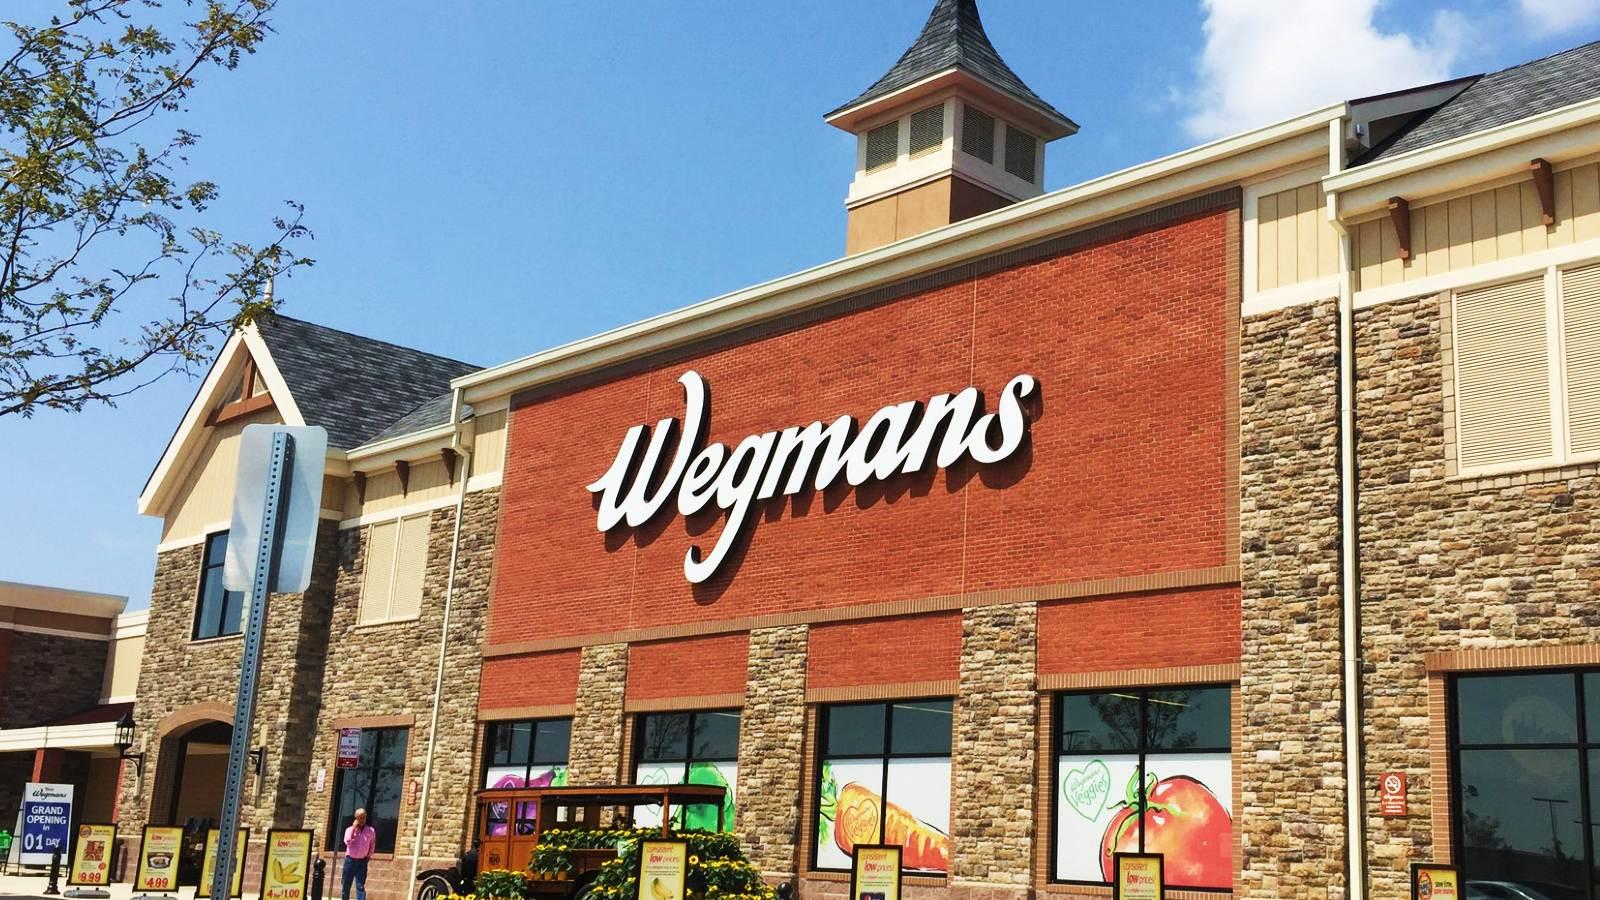 US supermarket chain Wegmans notifies customers of data breach